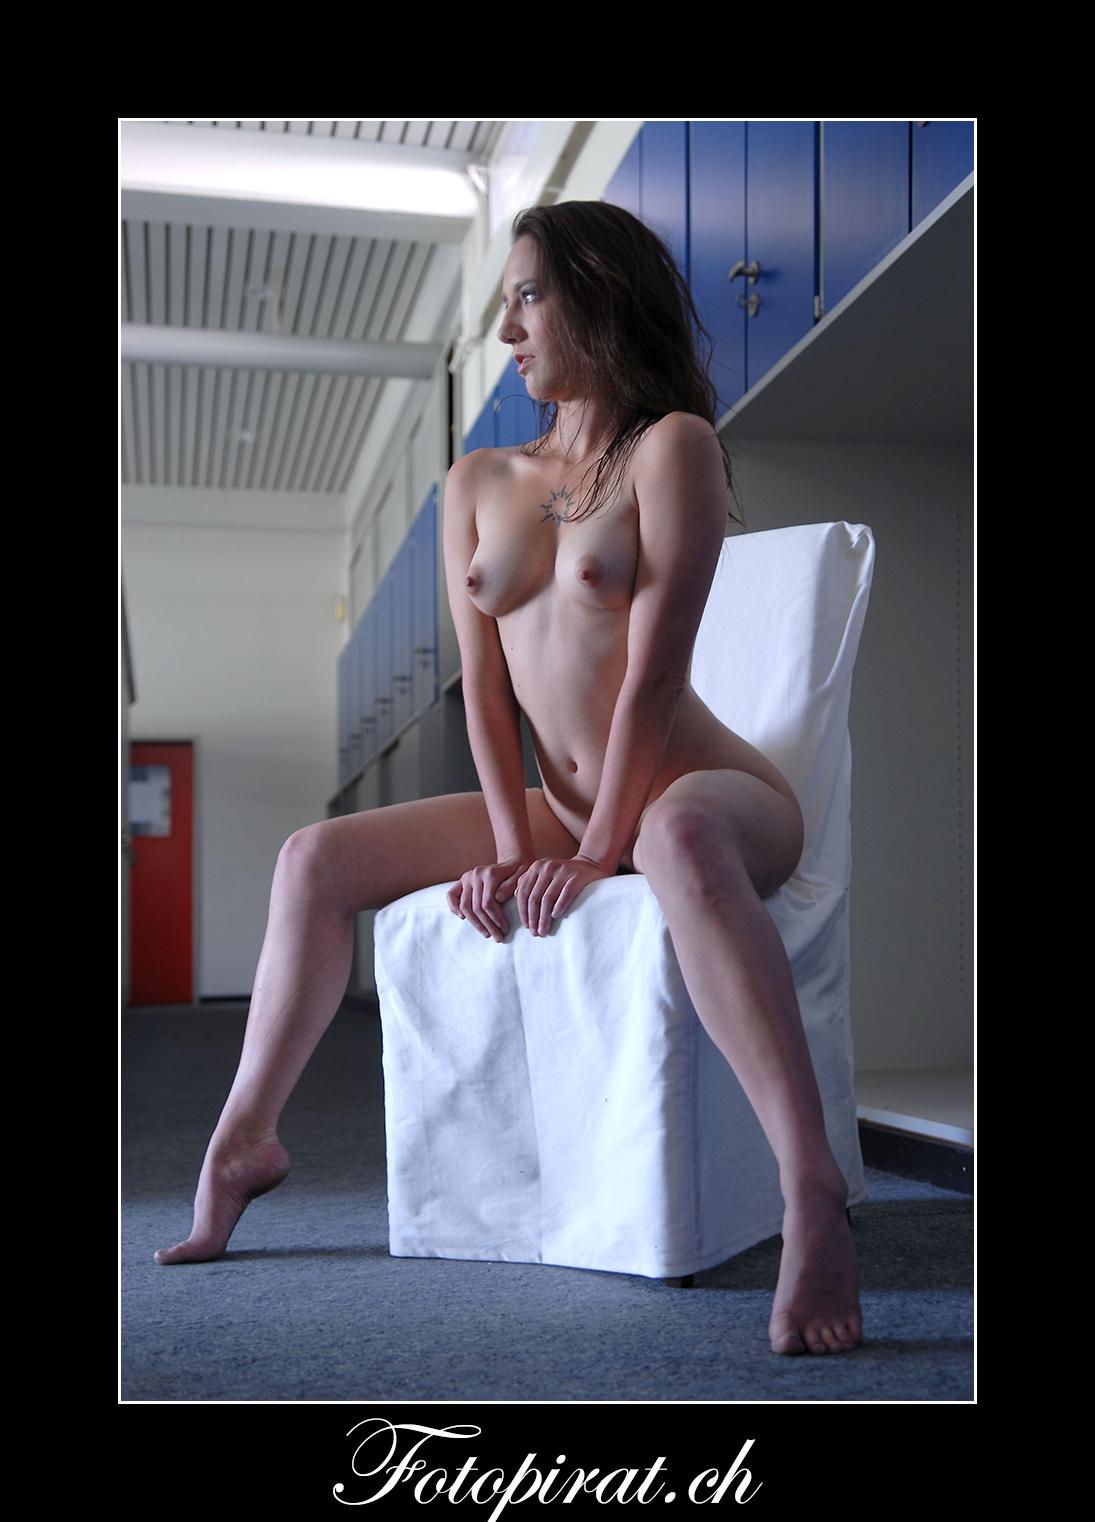 Fotoshooting, Fotostudio, Akt, Nackt, Nudeart, Nude, Modelagentur, Fotomodel, erotik, weisser Stuhl